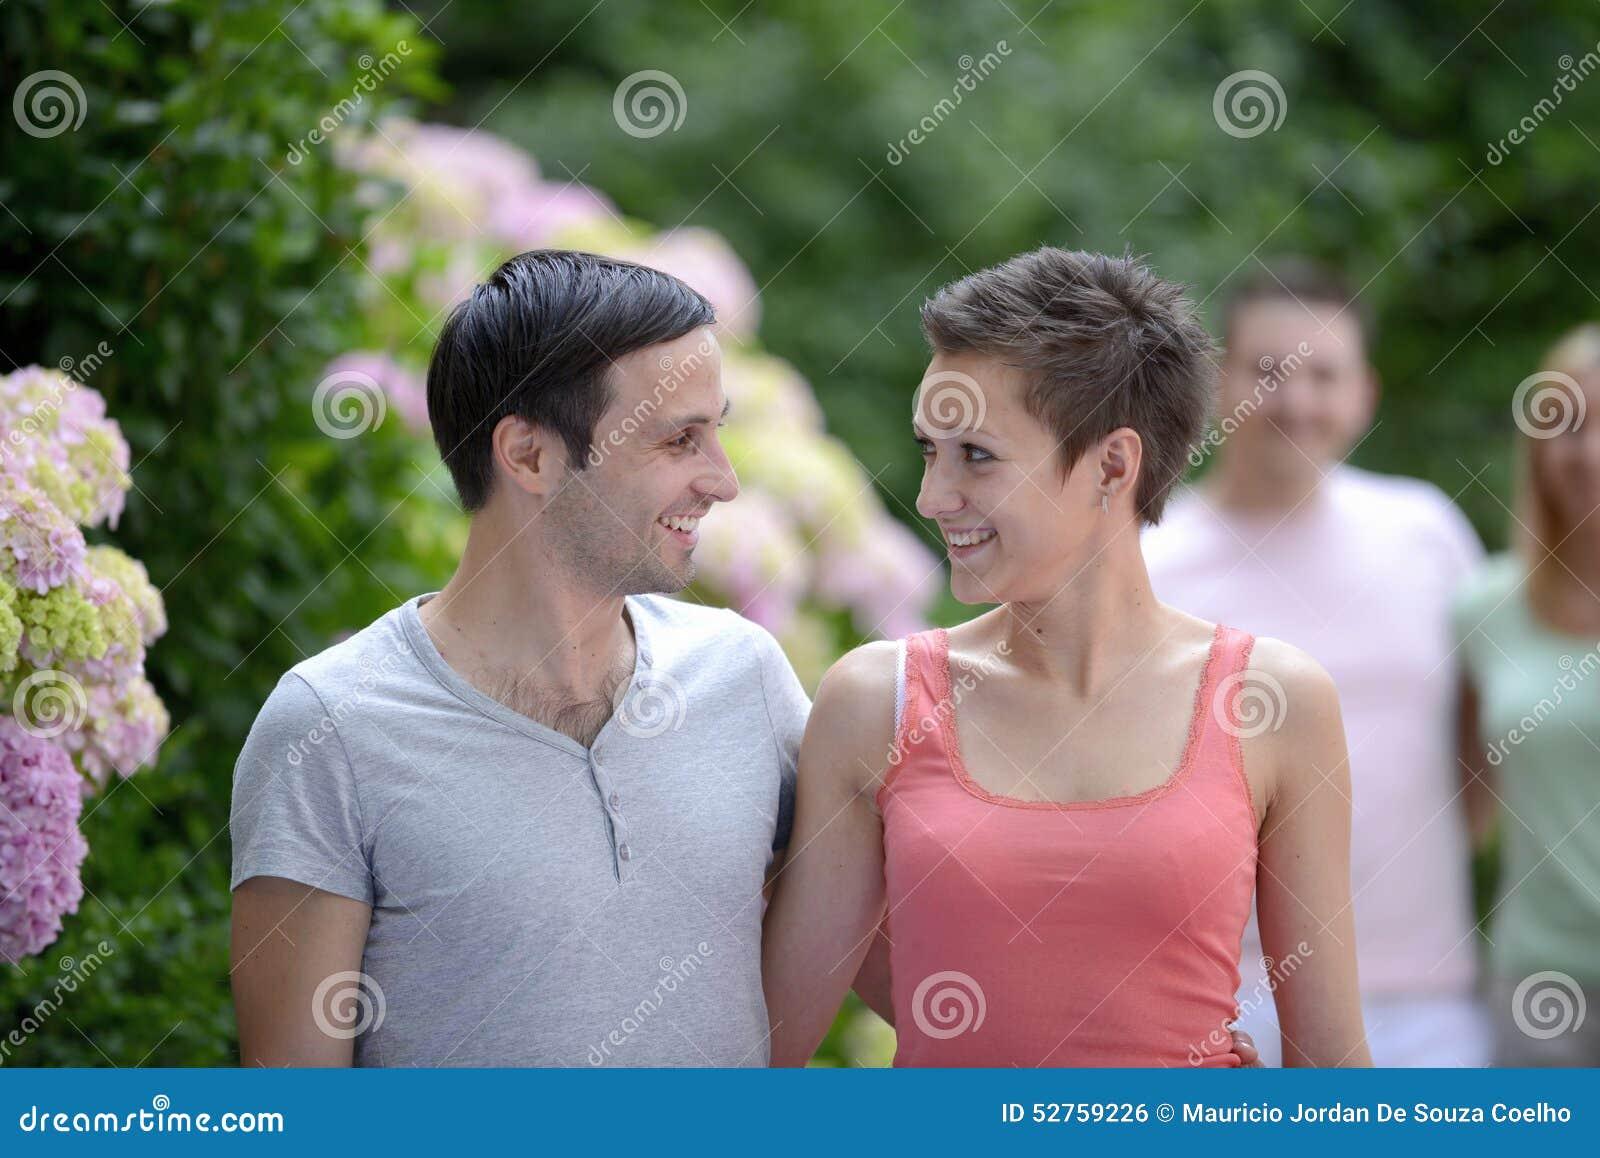 Portrait of a young heterosexual couple